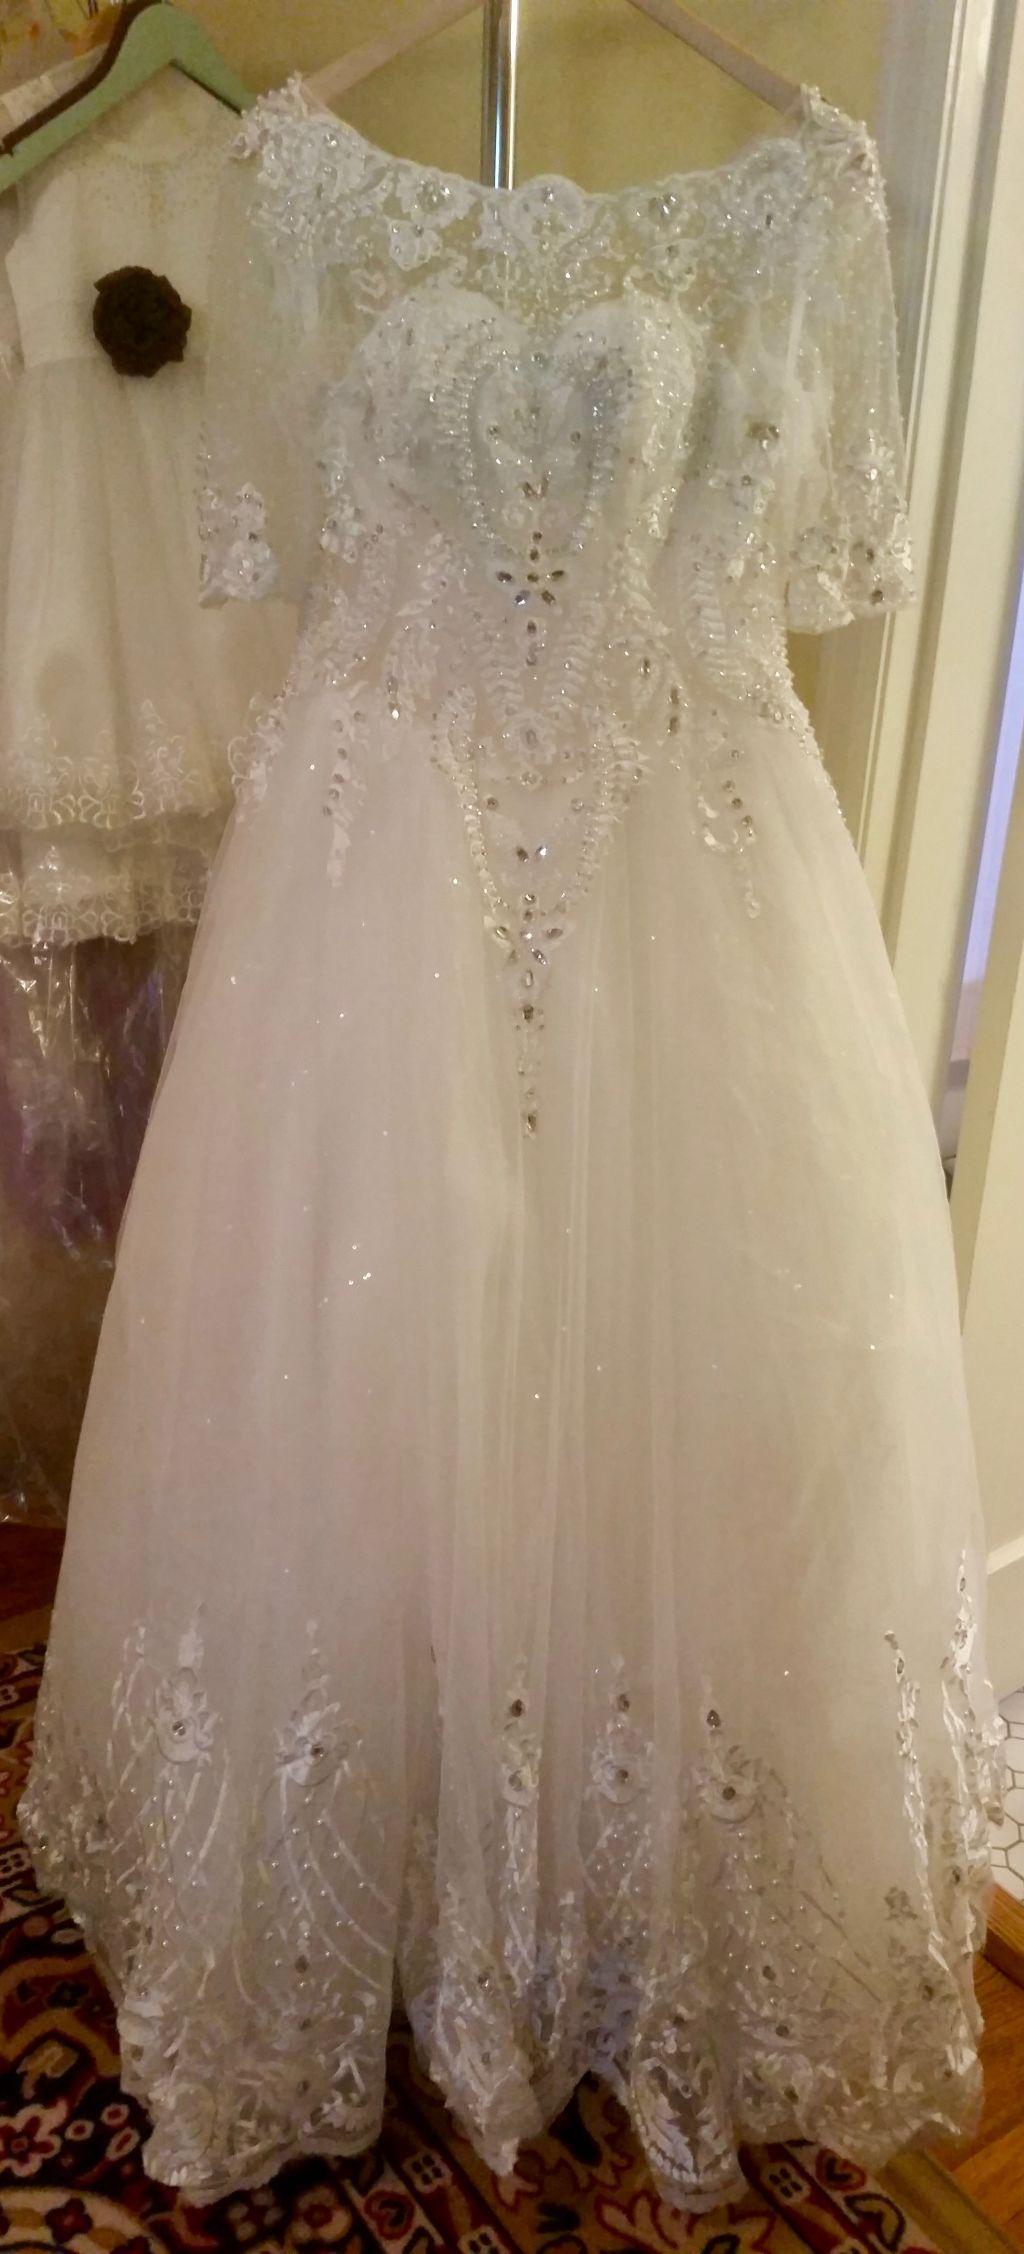 Lanna's Gorgeous Appliqué Sweetheart A Line Wedding Dress Without Train